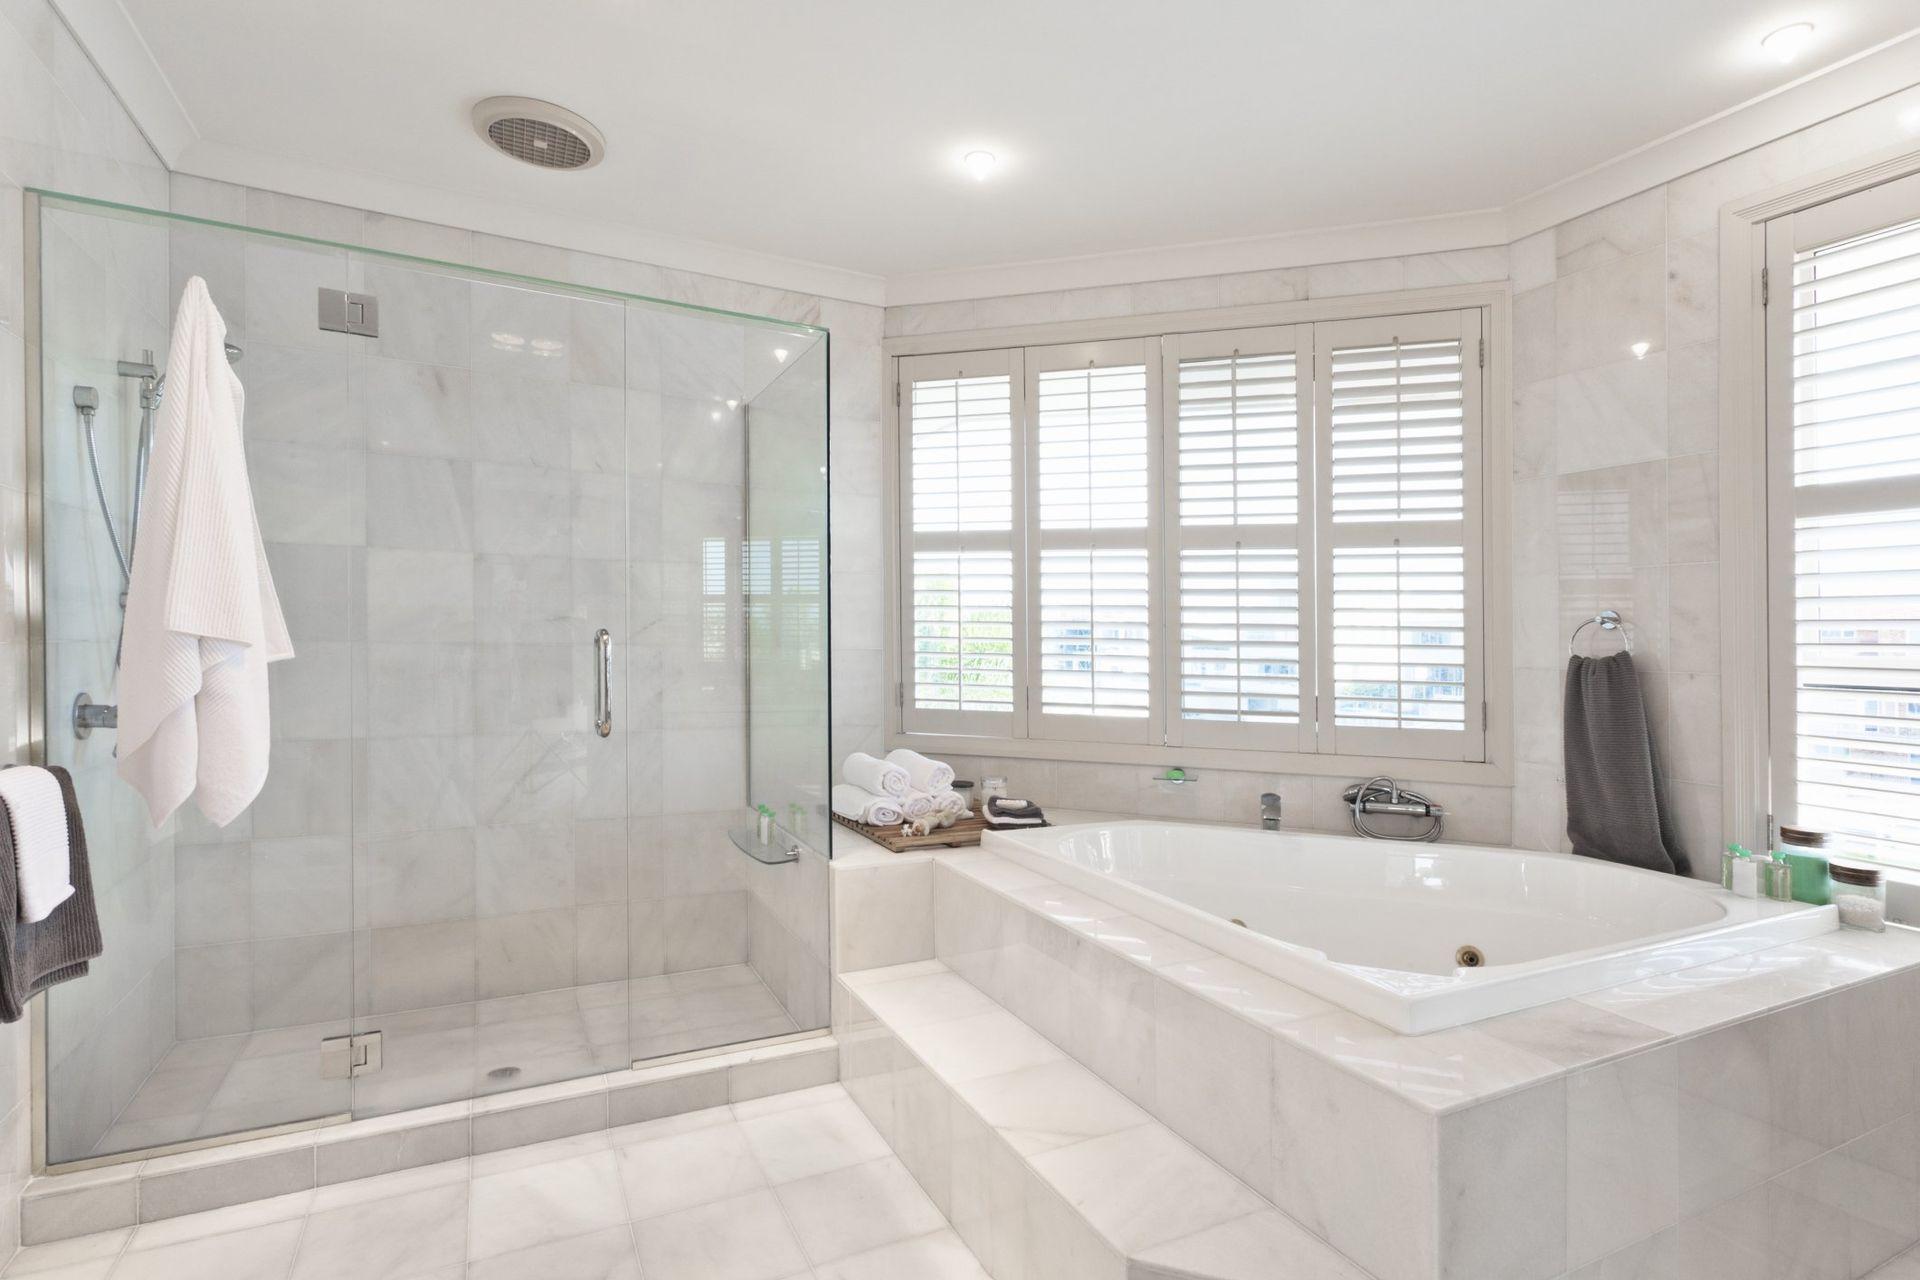 Bathroom Remodeling In Chattanooga, TN | Blazek Construction